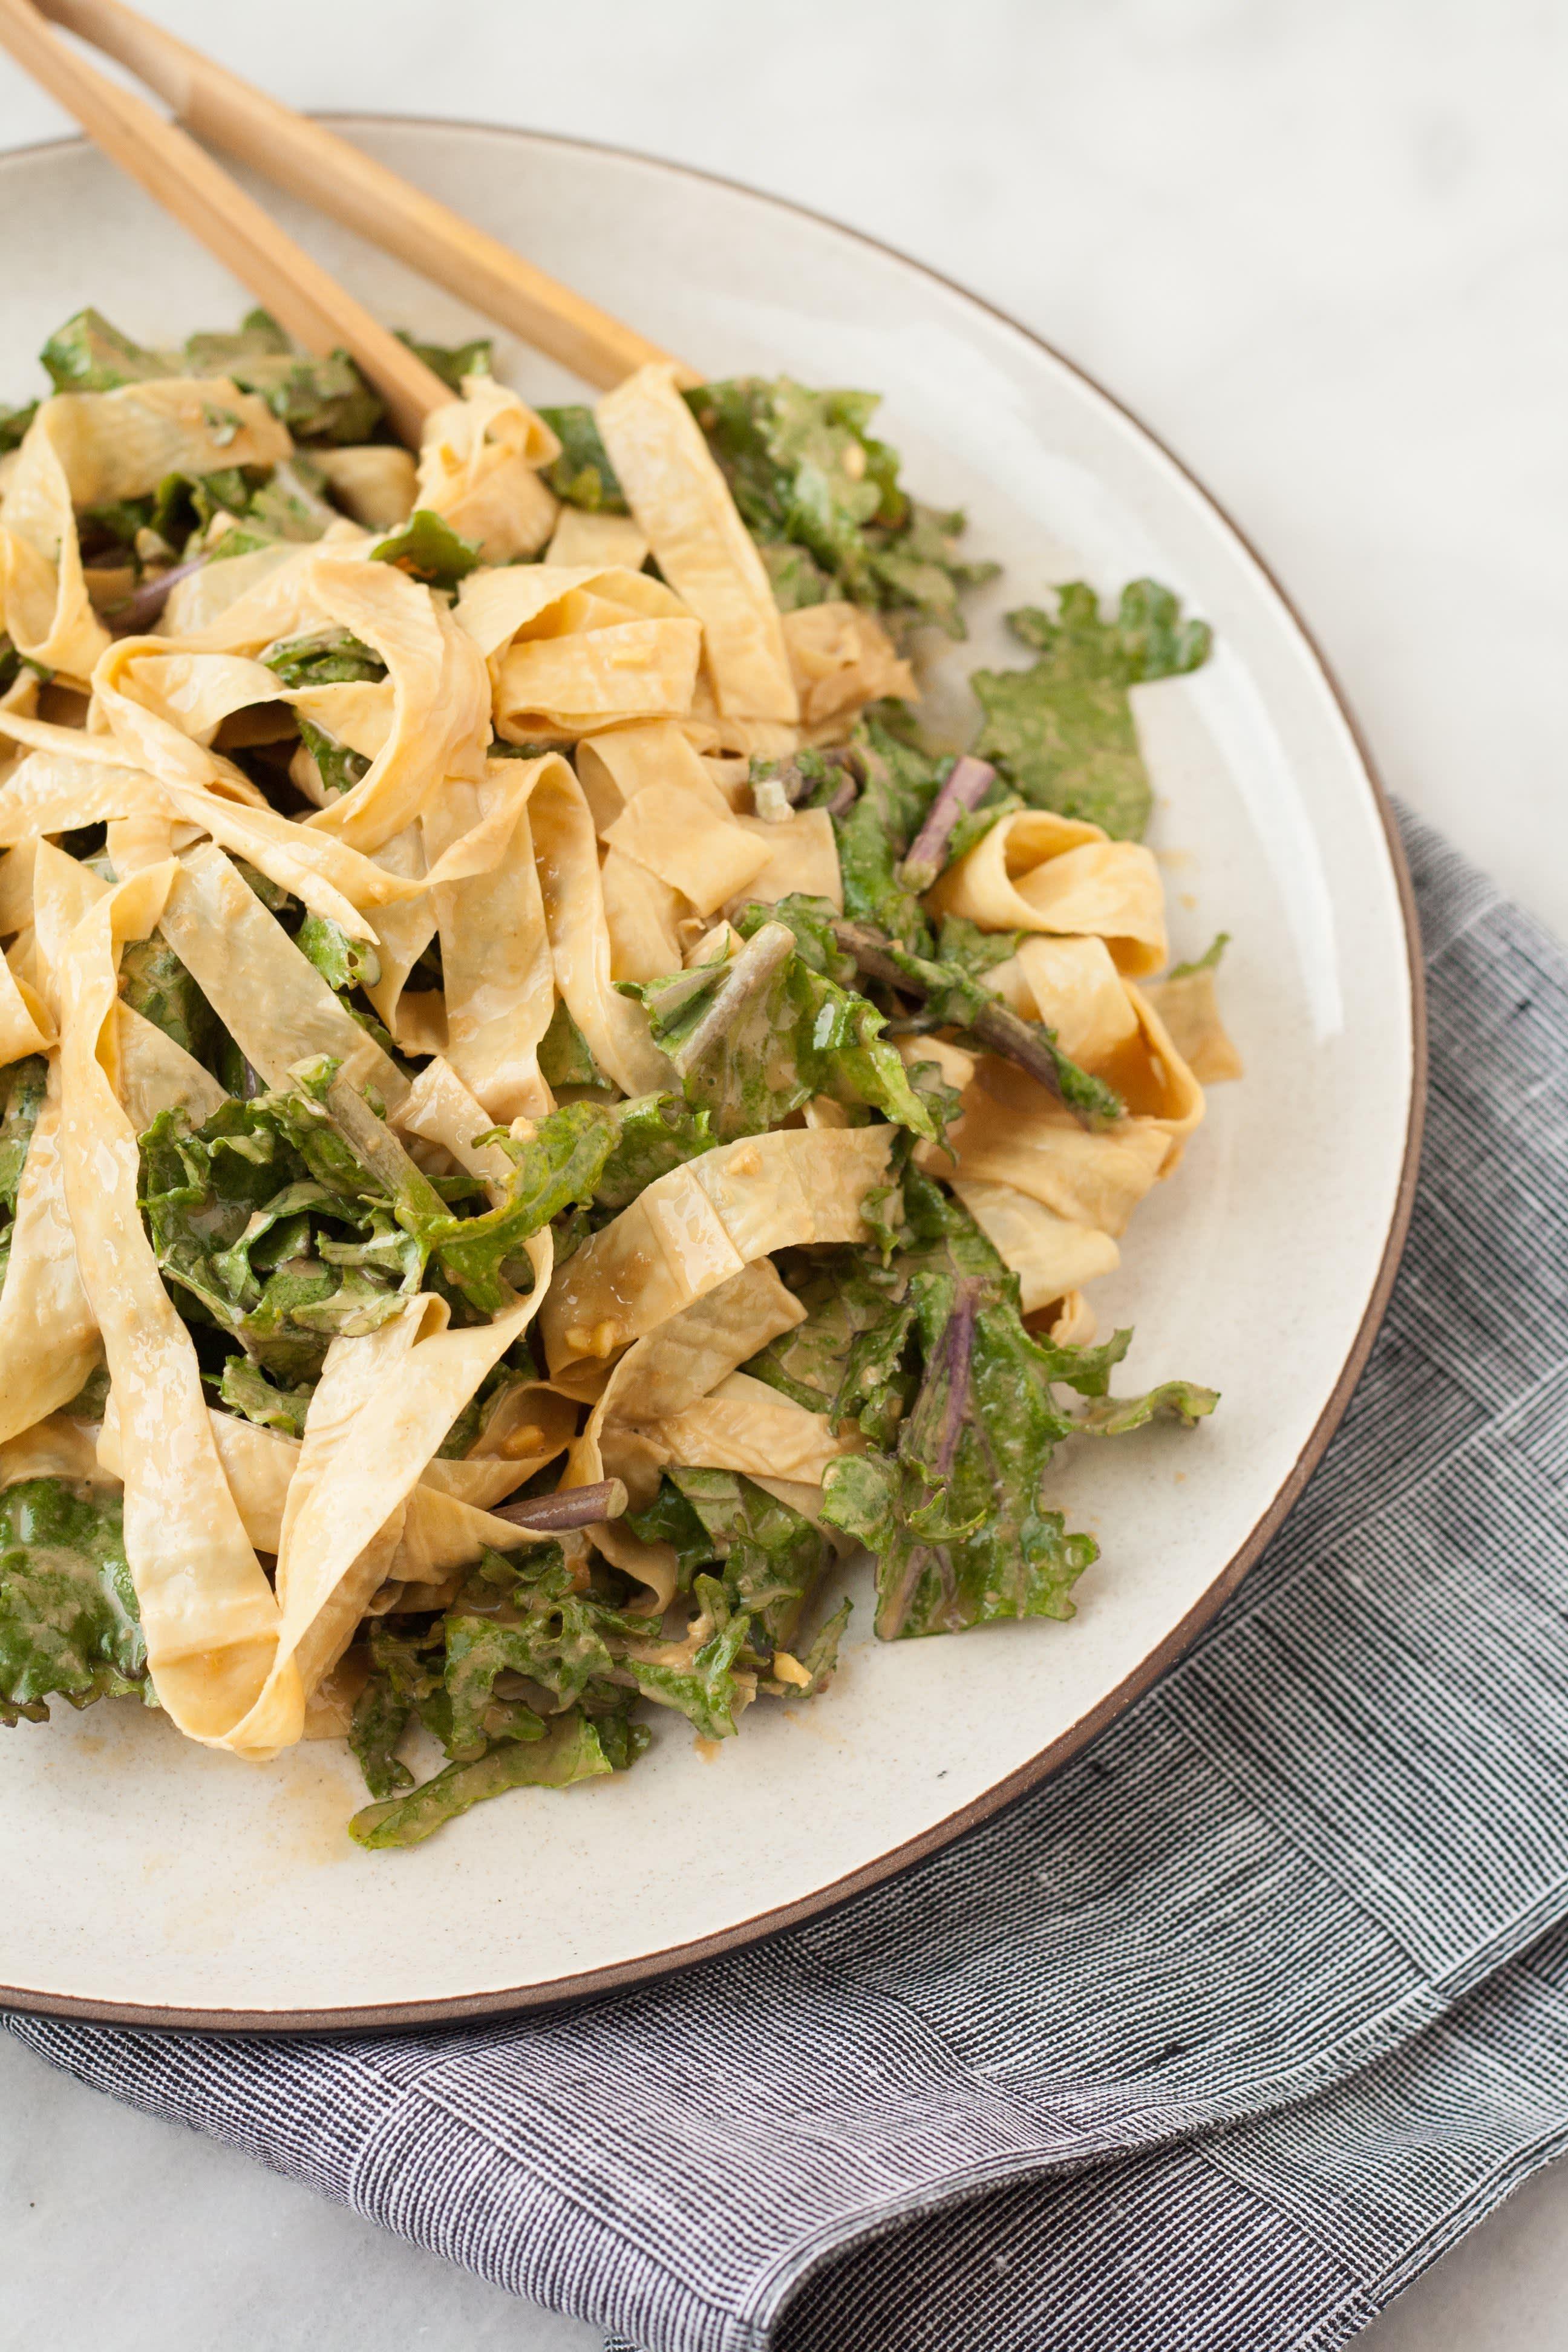 Yuba and kale salad